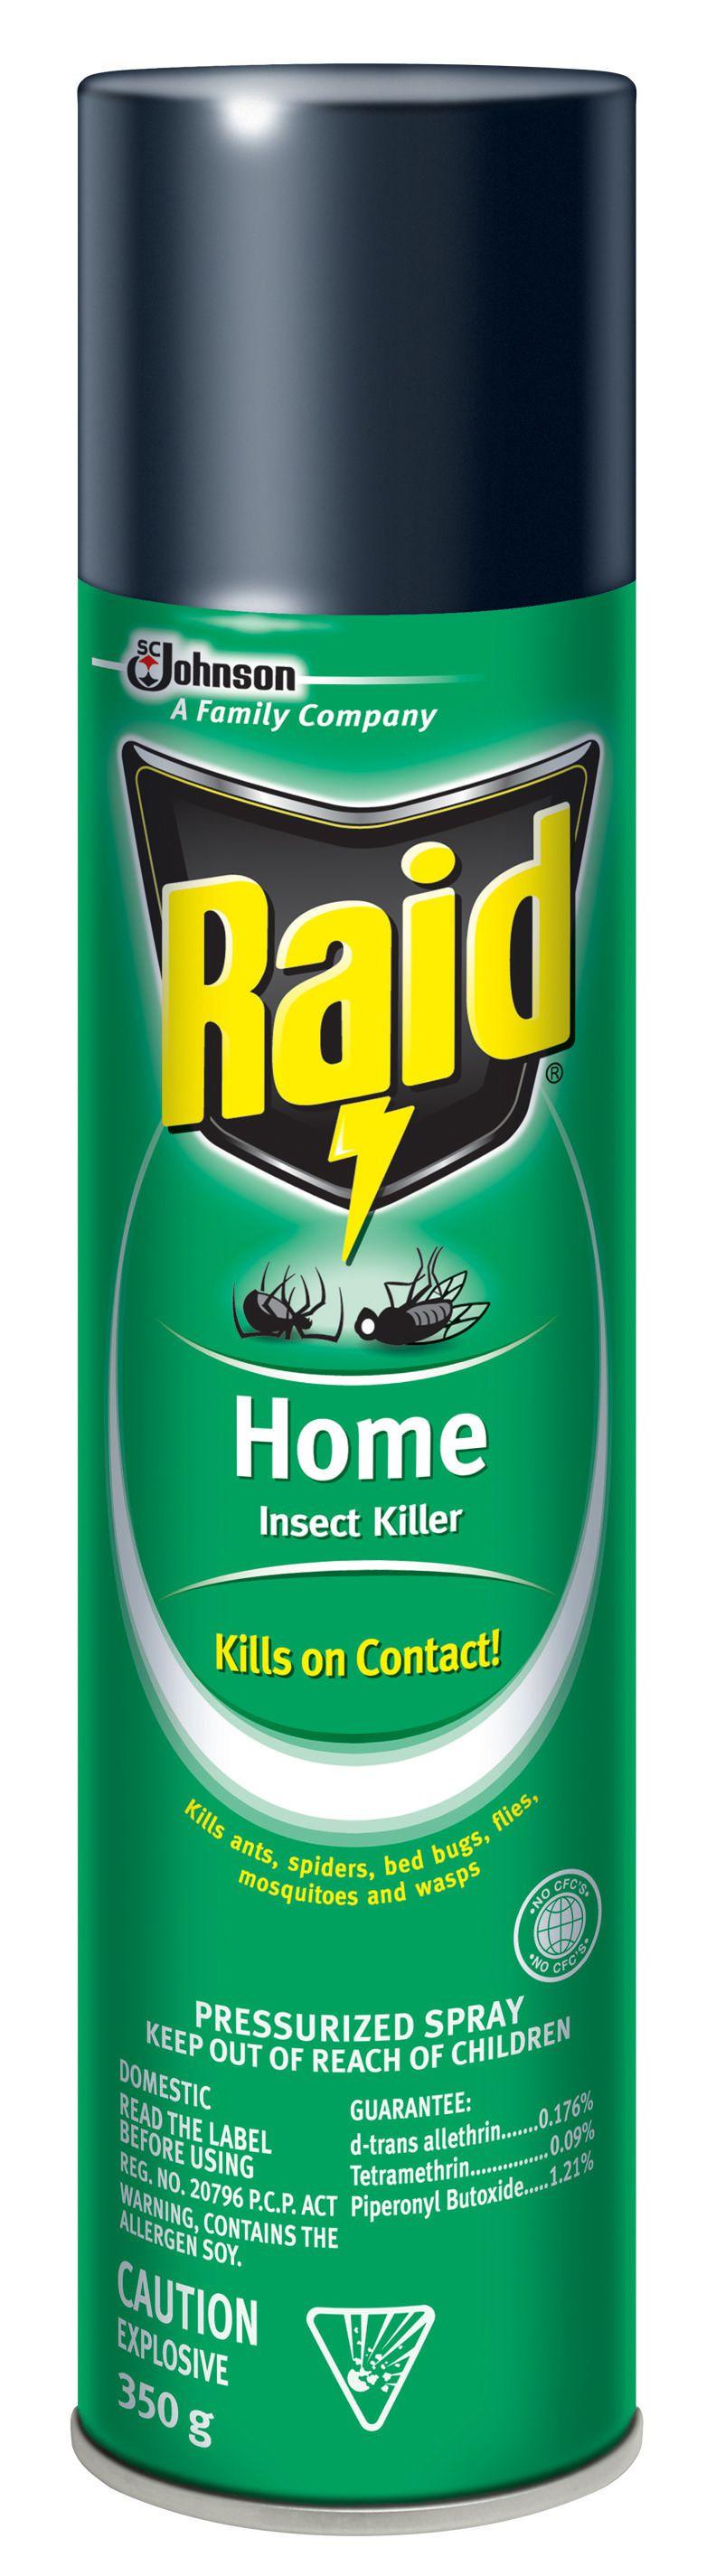 Does Raid Kill Bed Bugs Raid For Bed Bugs Can Talcum Powder Kill Bed Bugs Sleep